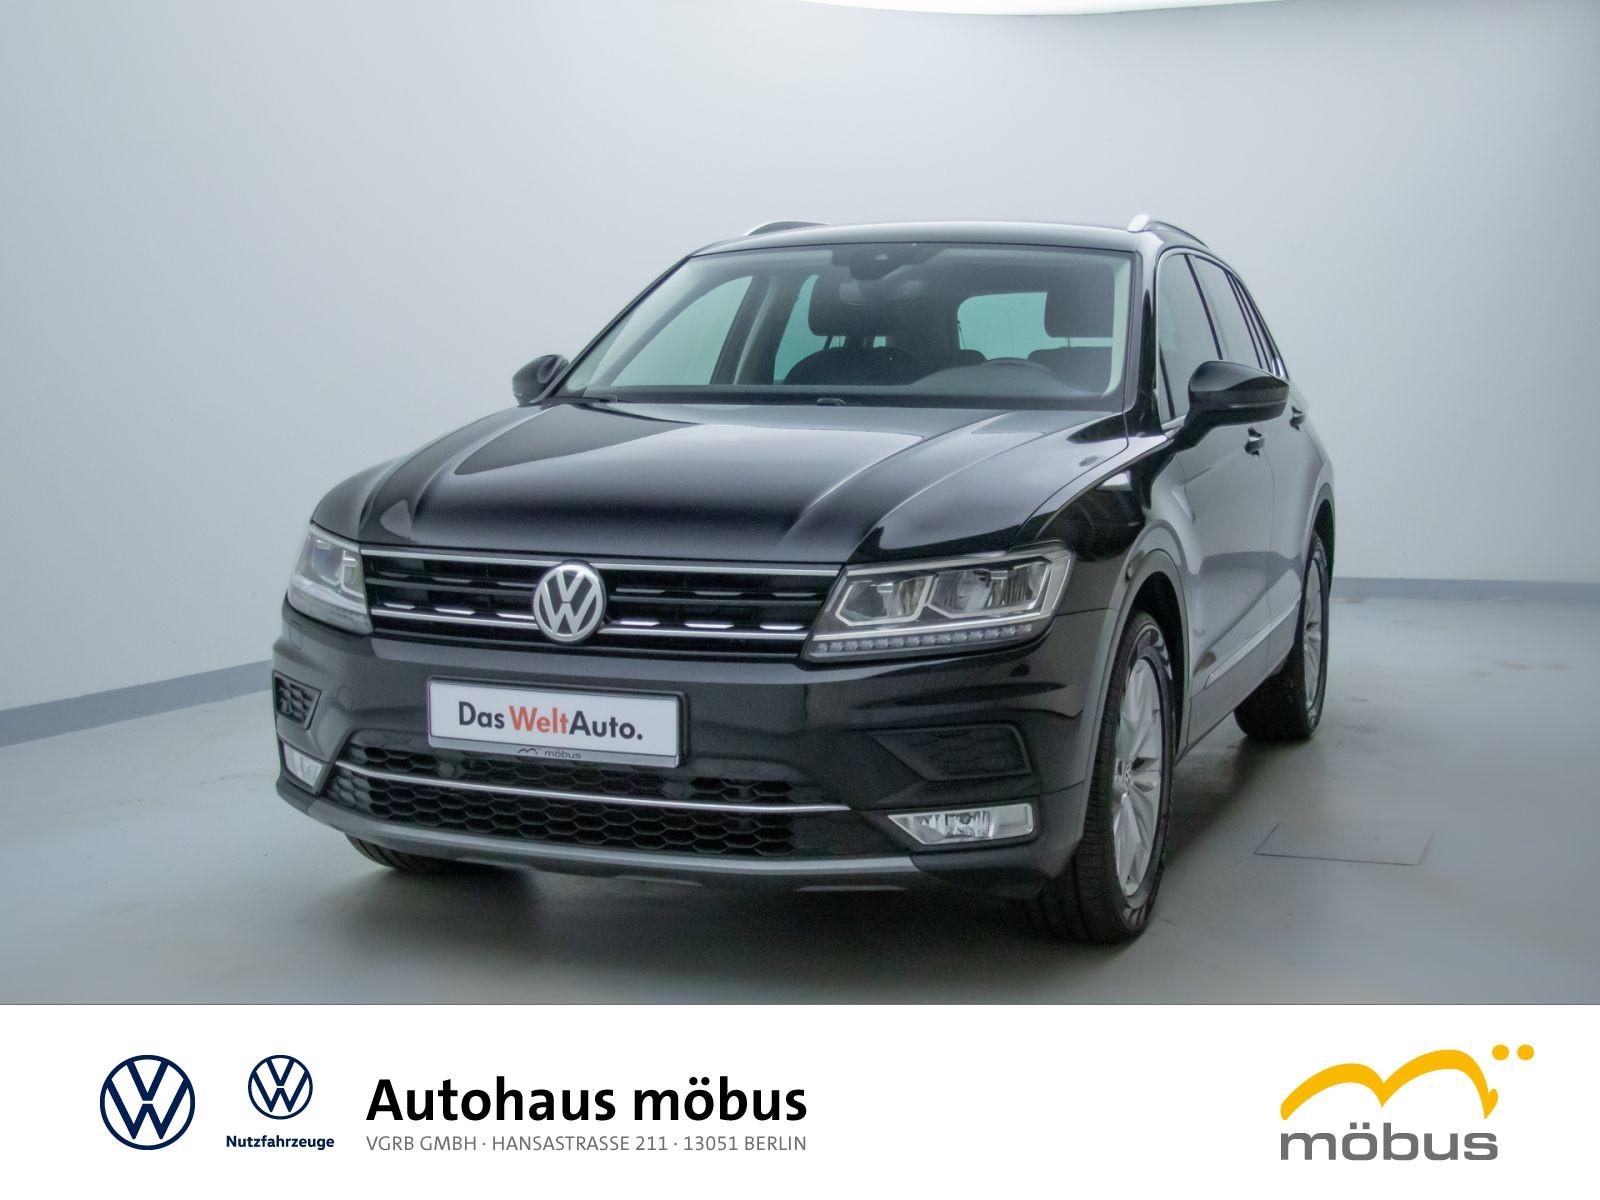 Volkswagen Tiguan 2.0 TDI DSG*HIGHL*4MOT*LED*AHK*AID*NAVI**, Jahr 2017, Diesel